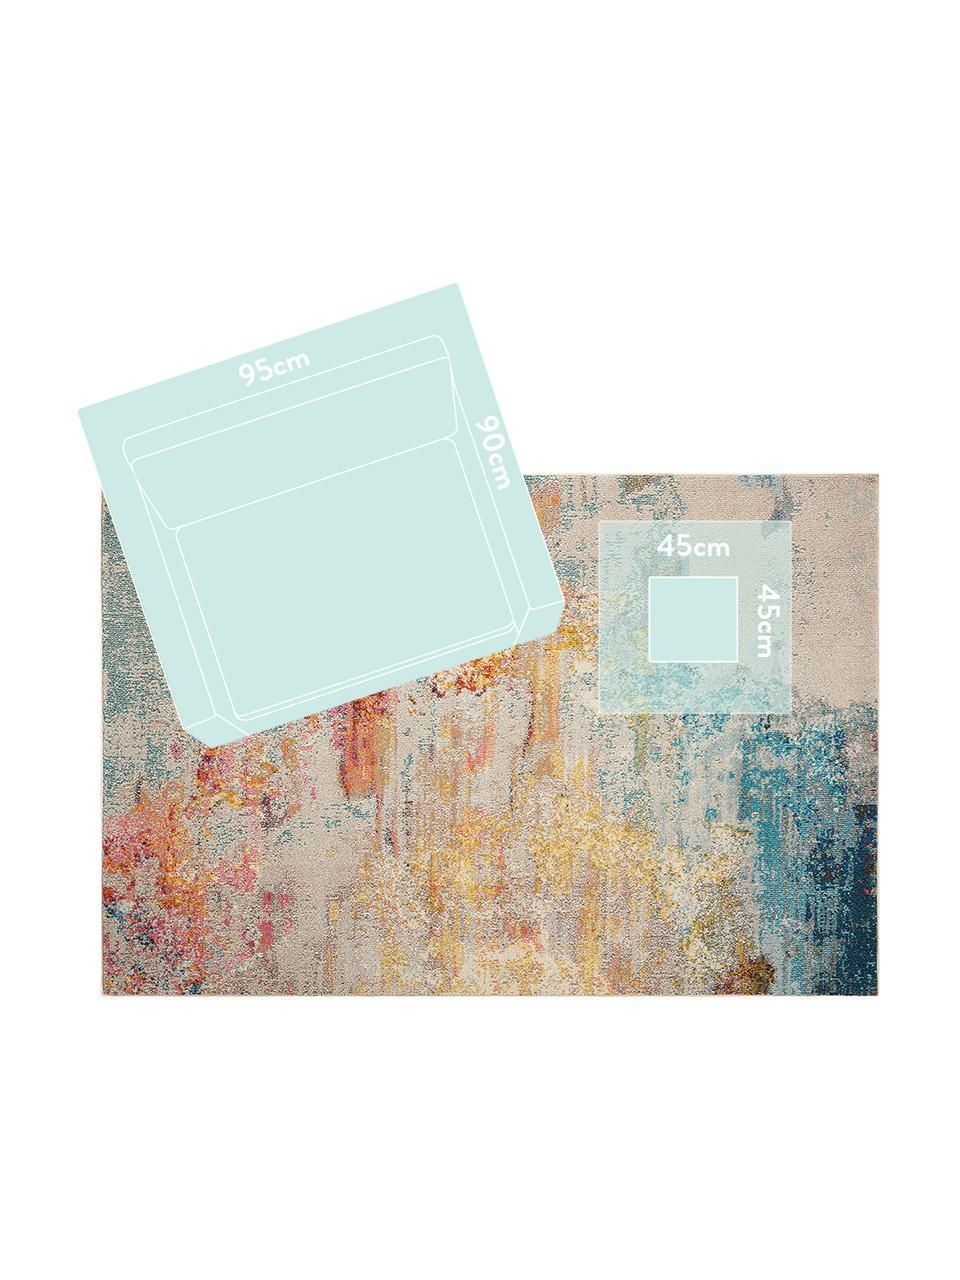 Designteppich Celestial in Bunt, Flor: 100% Polypropylen, Mehrfarbig, B 160 x L 220 cm (Größe M)